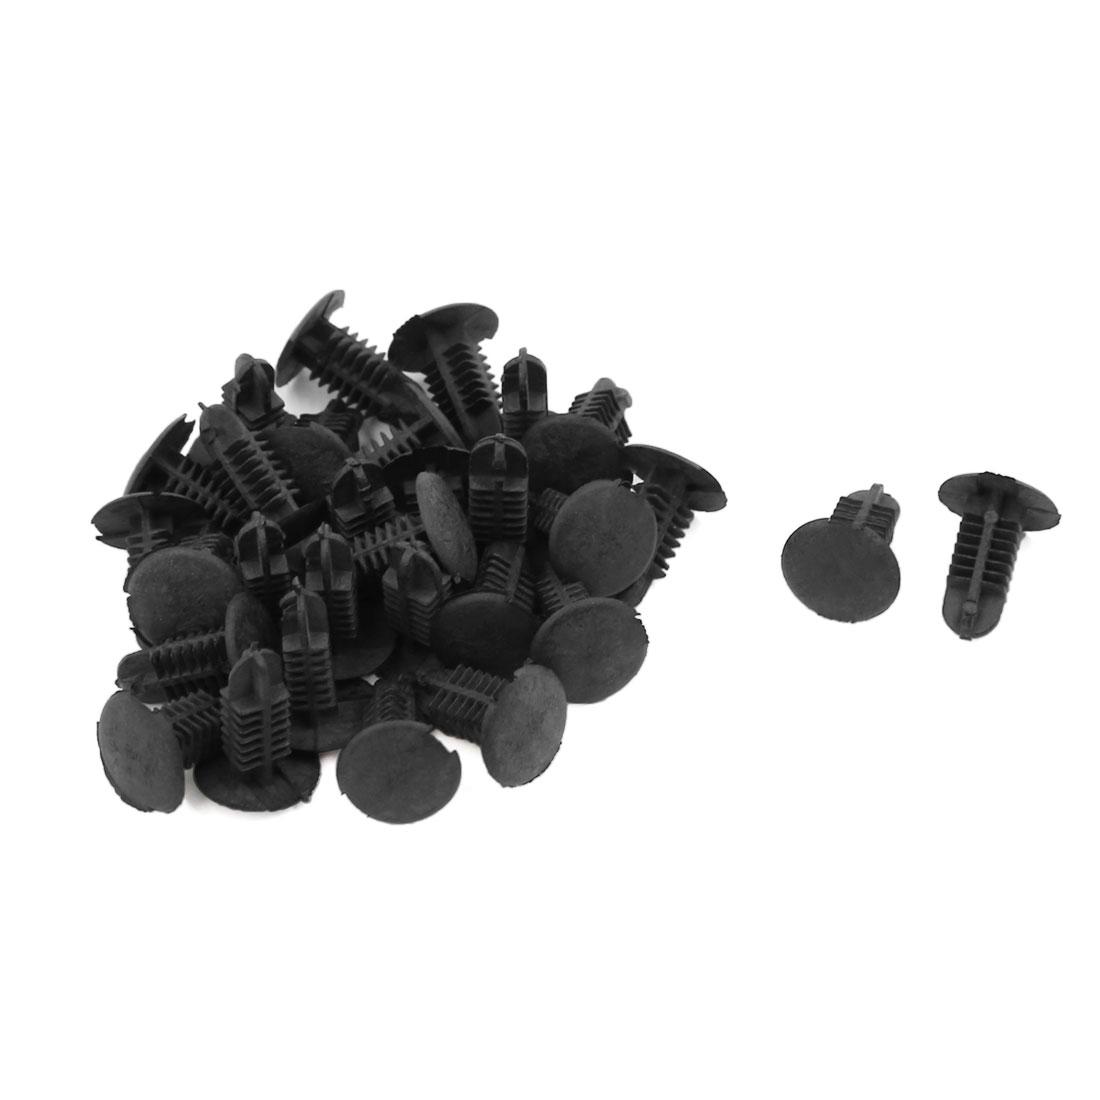 30 Pcs Black Plastic Splash Guard Moulding Bumper Clips 6mm x 5mm